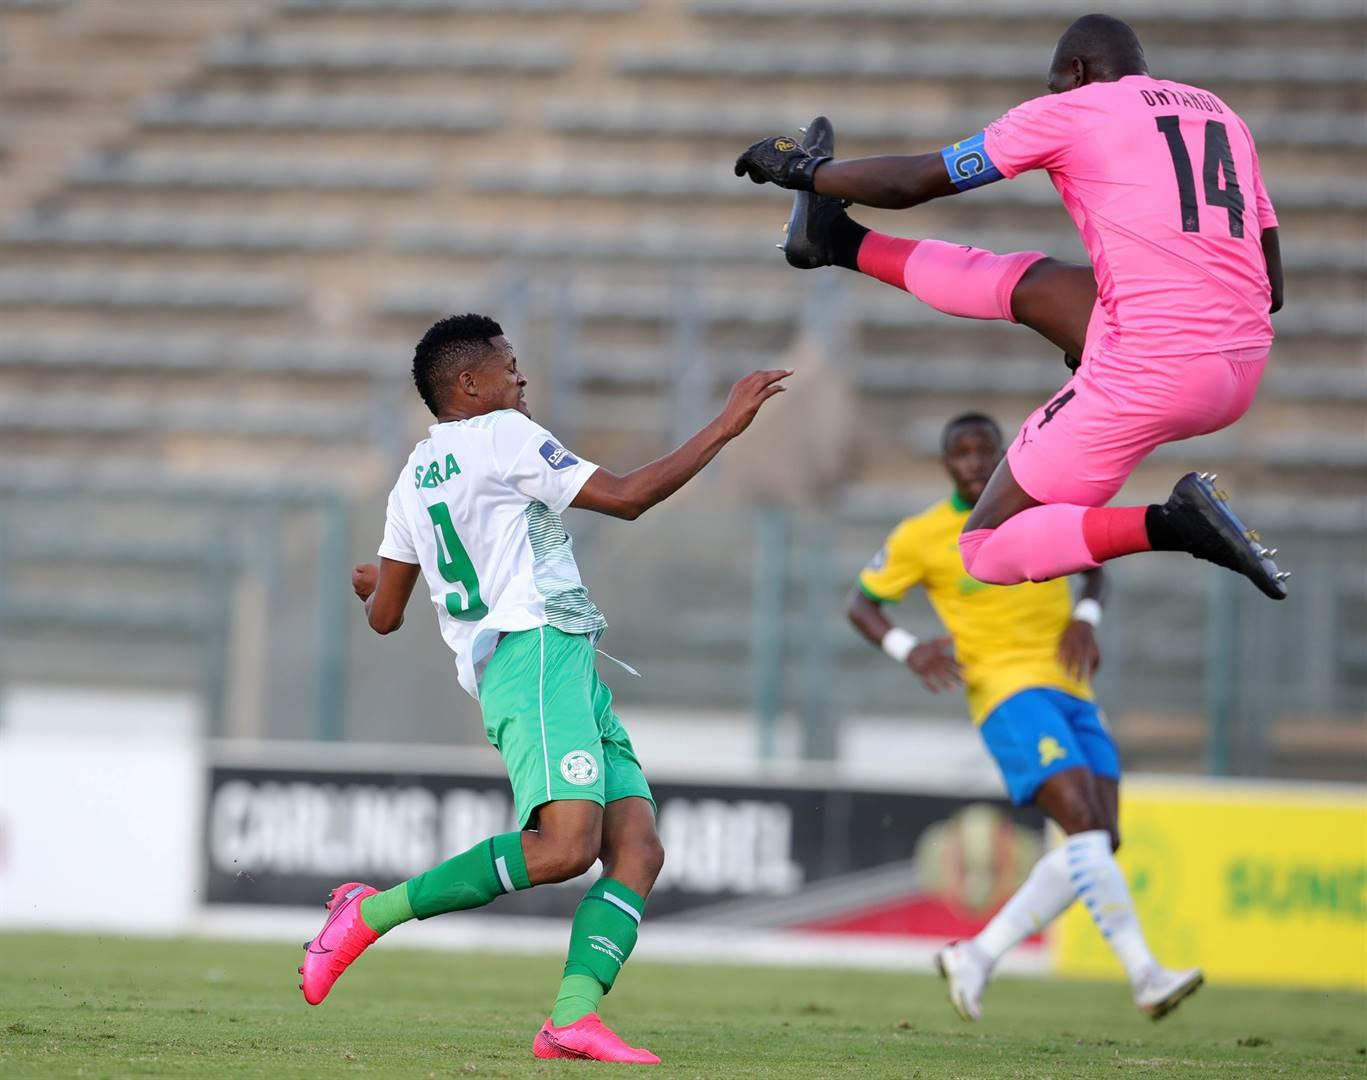 Bloemfontein Celtic striker Motebang Sera, seen here being challenged by Mamelodi Sundowns goalkeeper Denis Onyango, had his goal disallowed in this game on Tuesday. Picture: Samuel Shivambu / BackpagePix